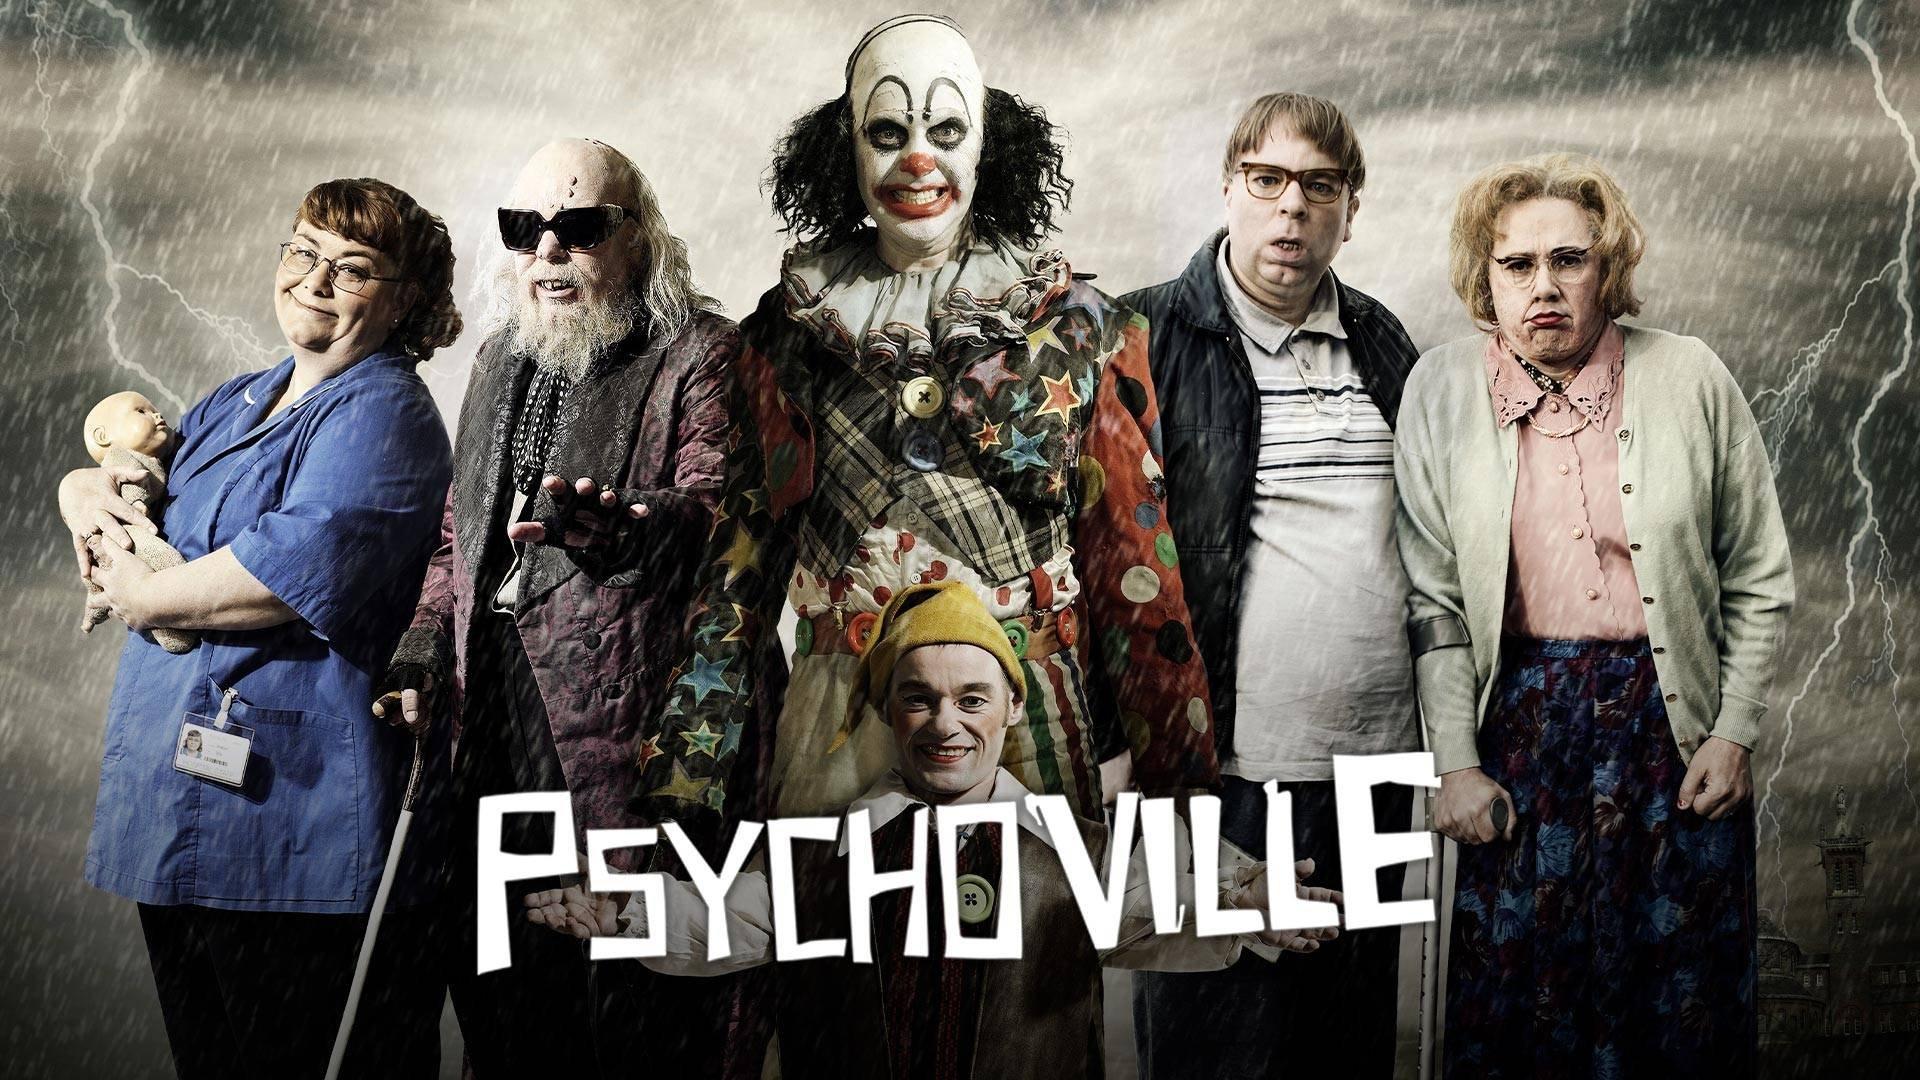 Psychoville on BritBox UK